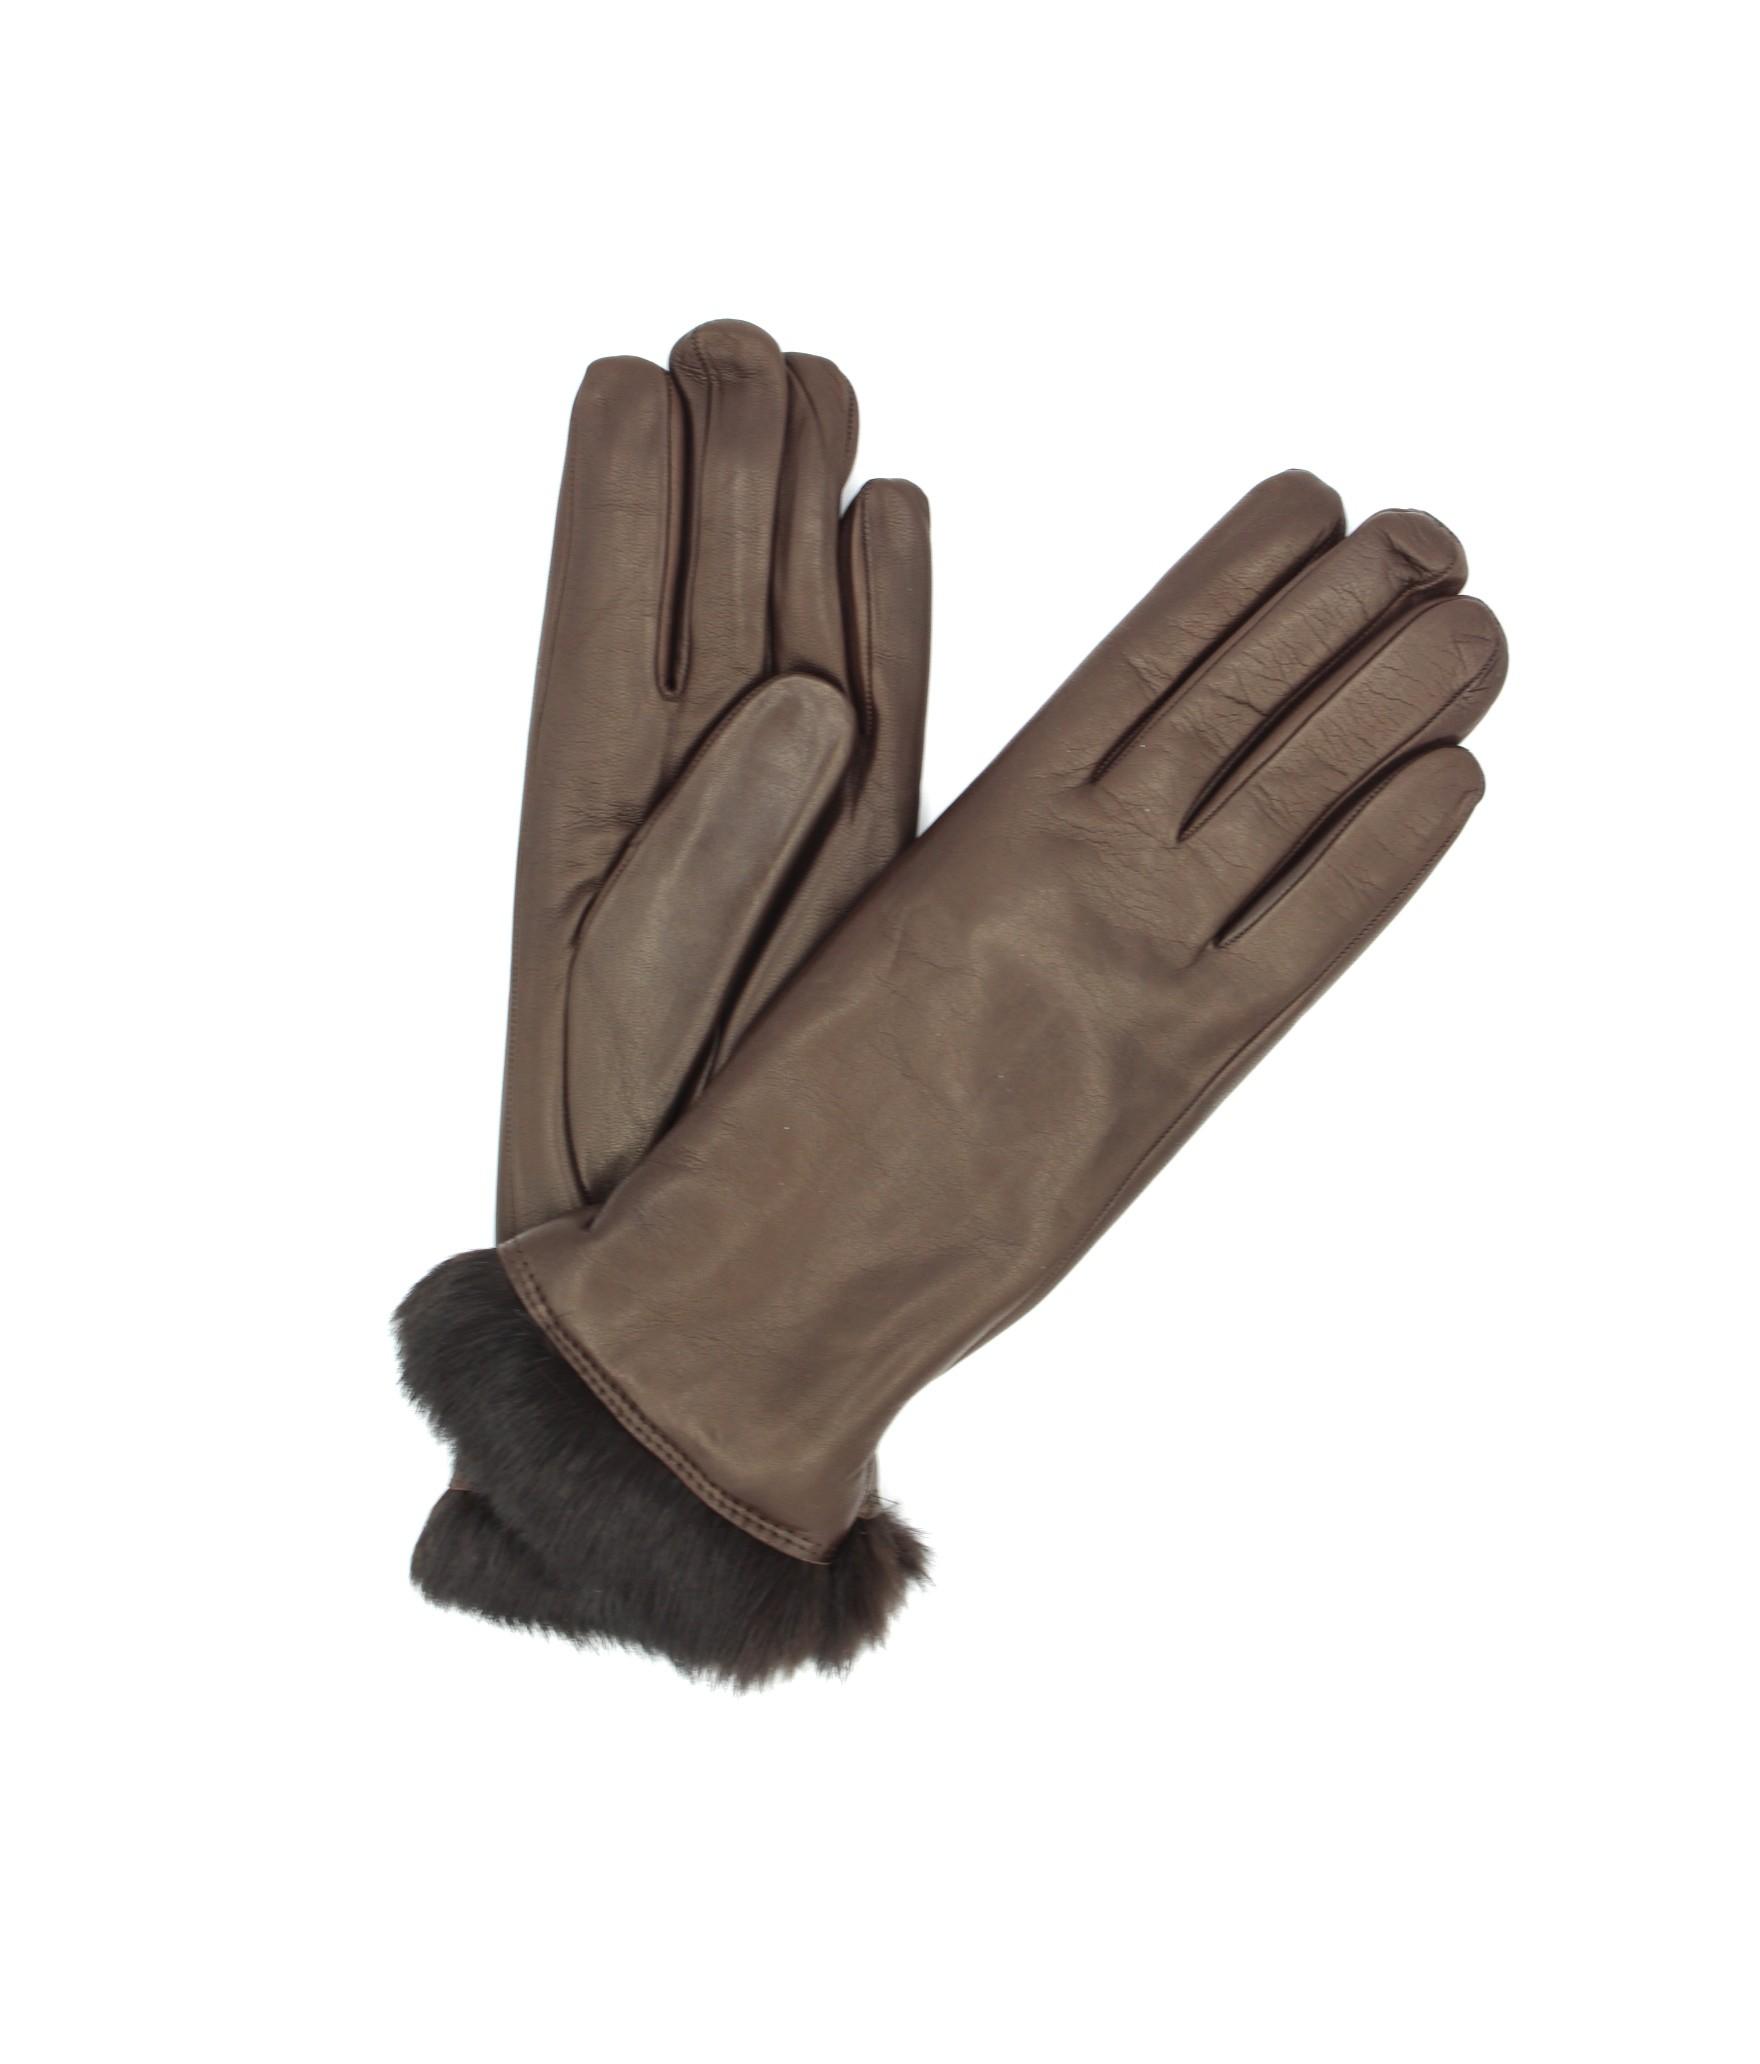 Nappa leather gloves 4bt Rabbir fur lined Dark Brown Sermoneta